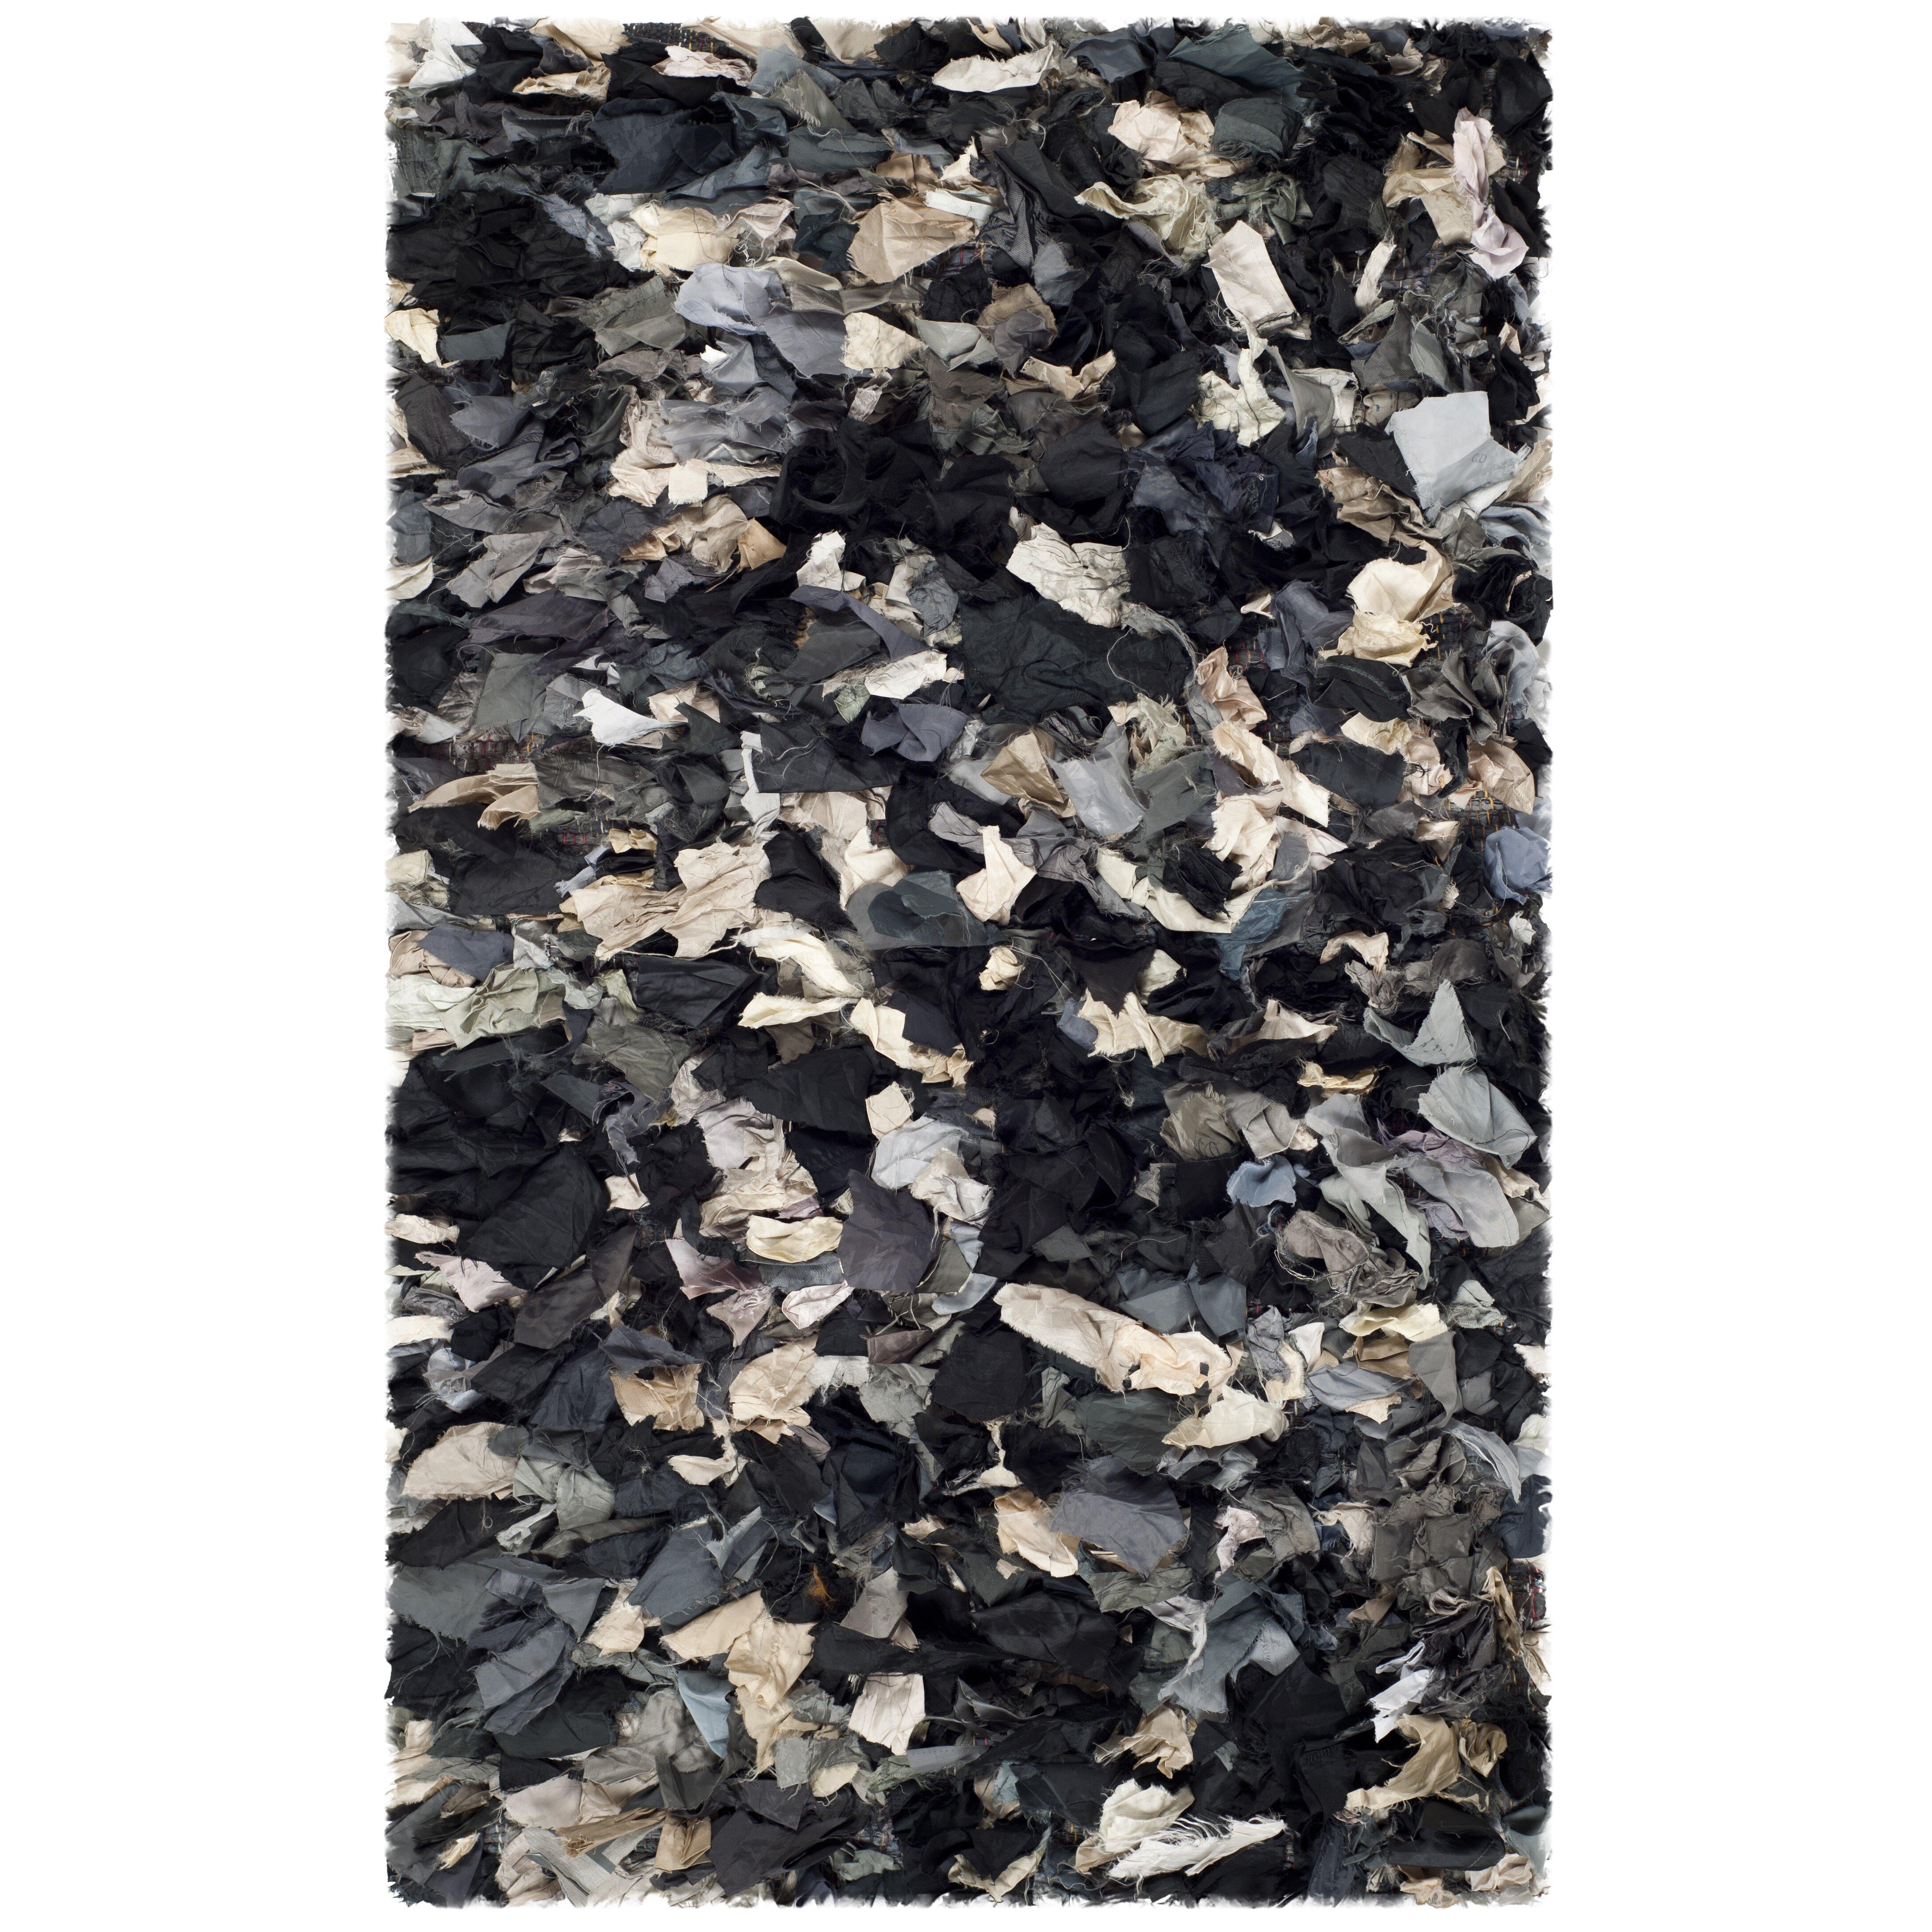 Black And Grey Rugs: Safavieh Shag Black & Gray Area Rug & Reviews